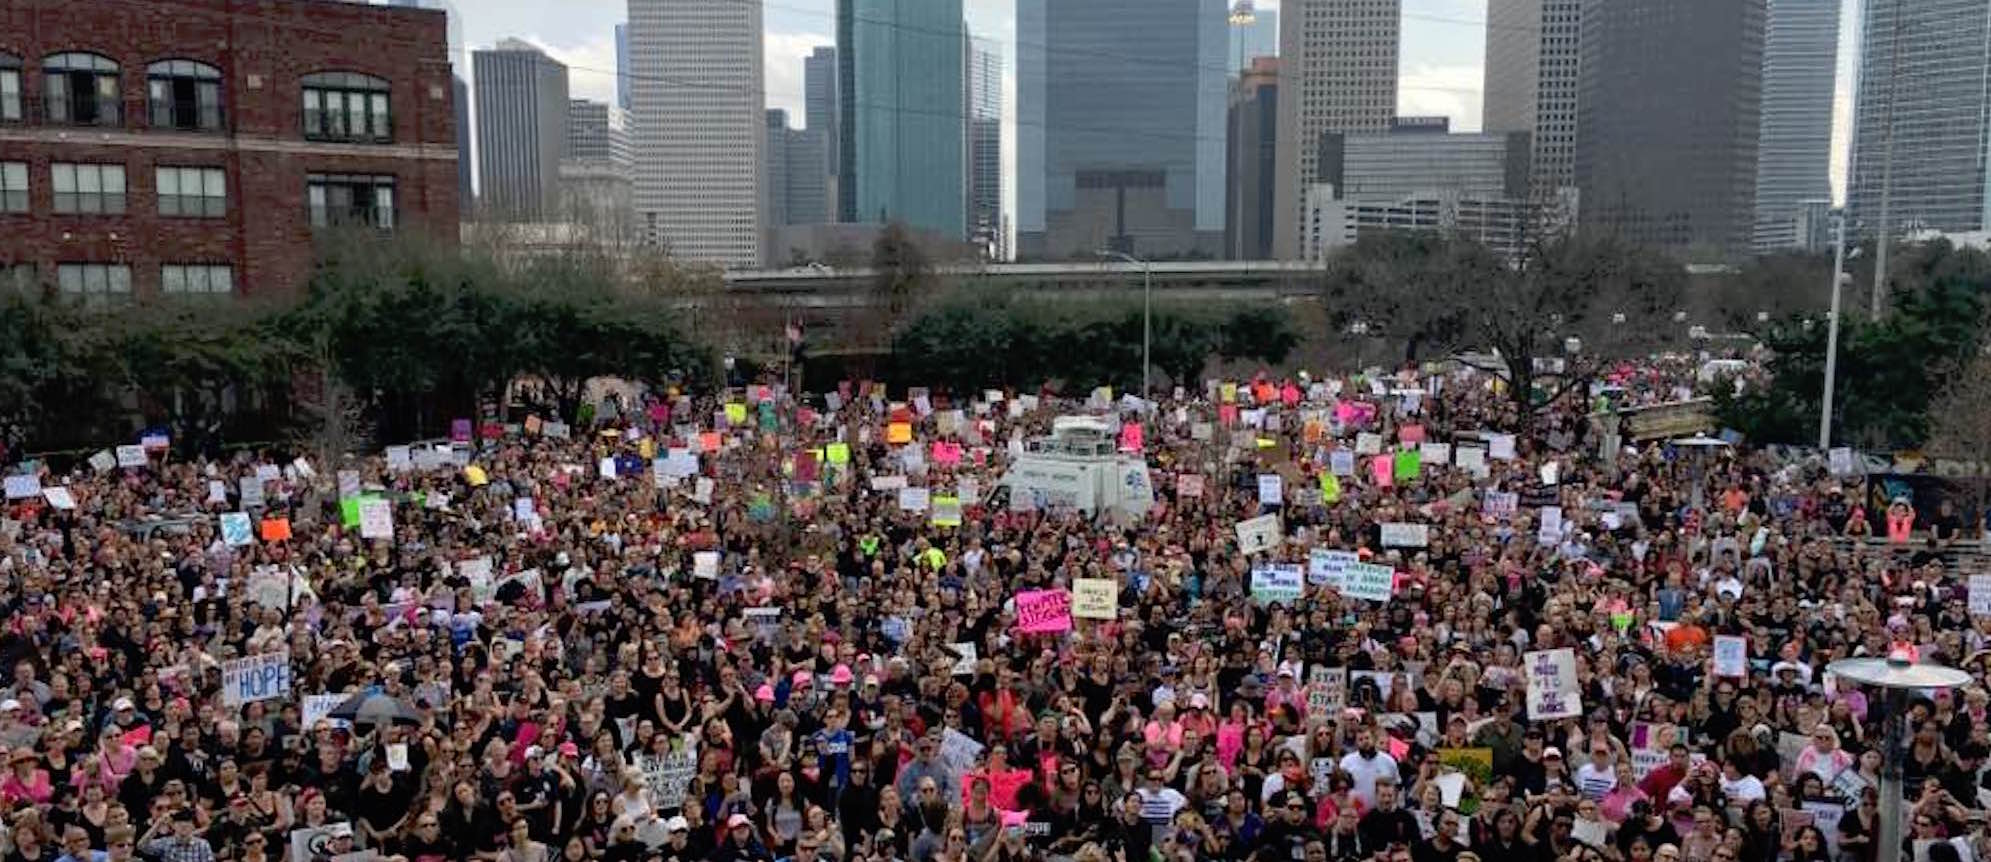 Jan_21_17_houston_womens_march_fb_header